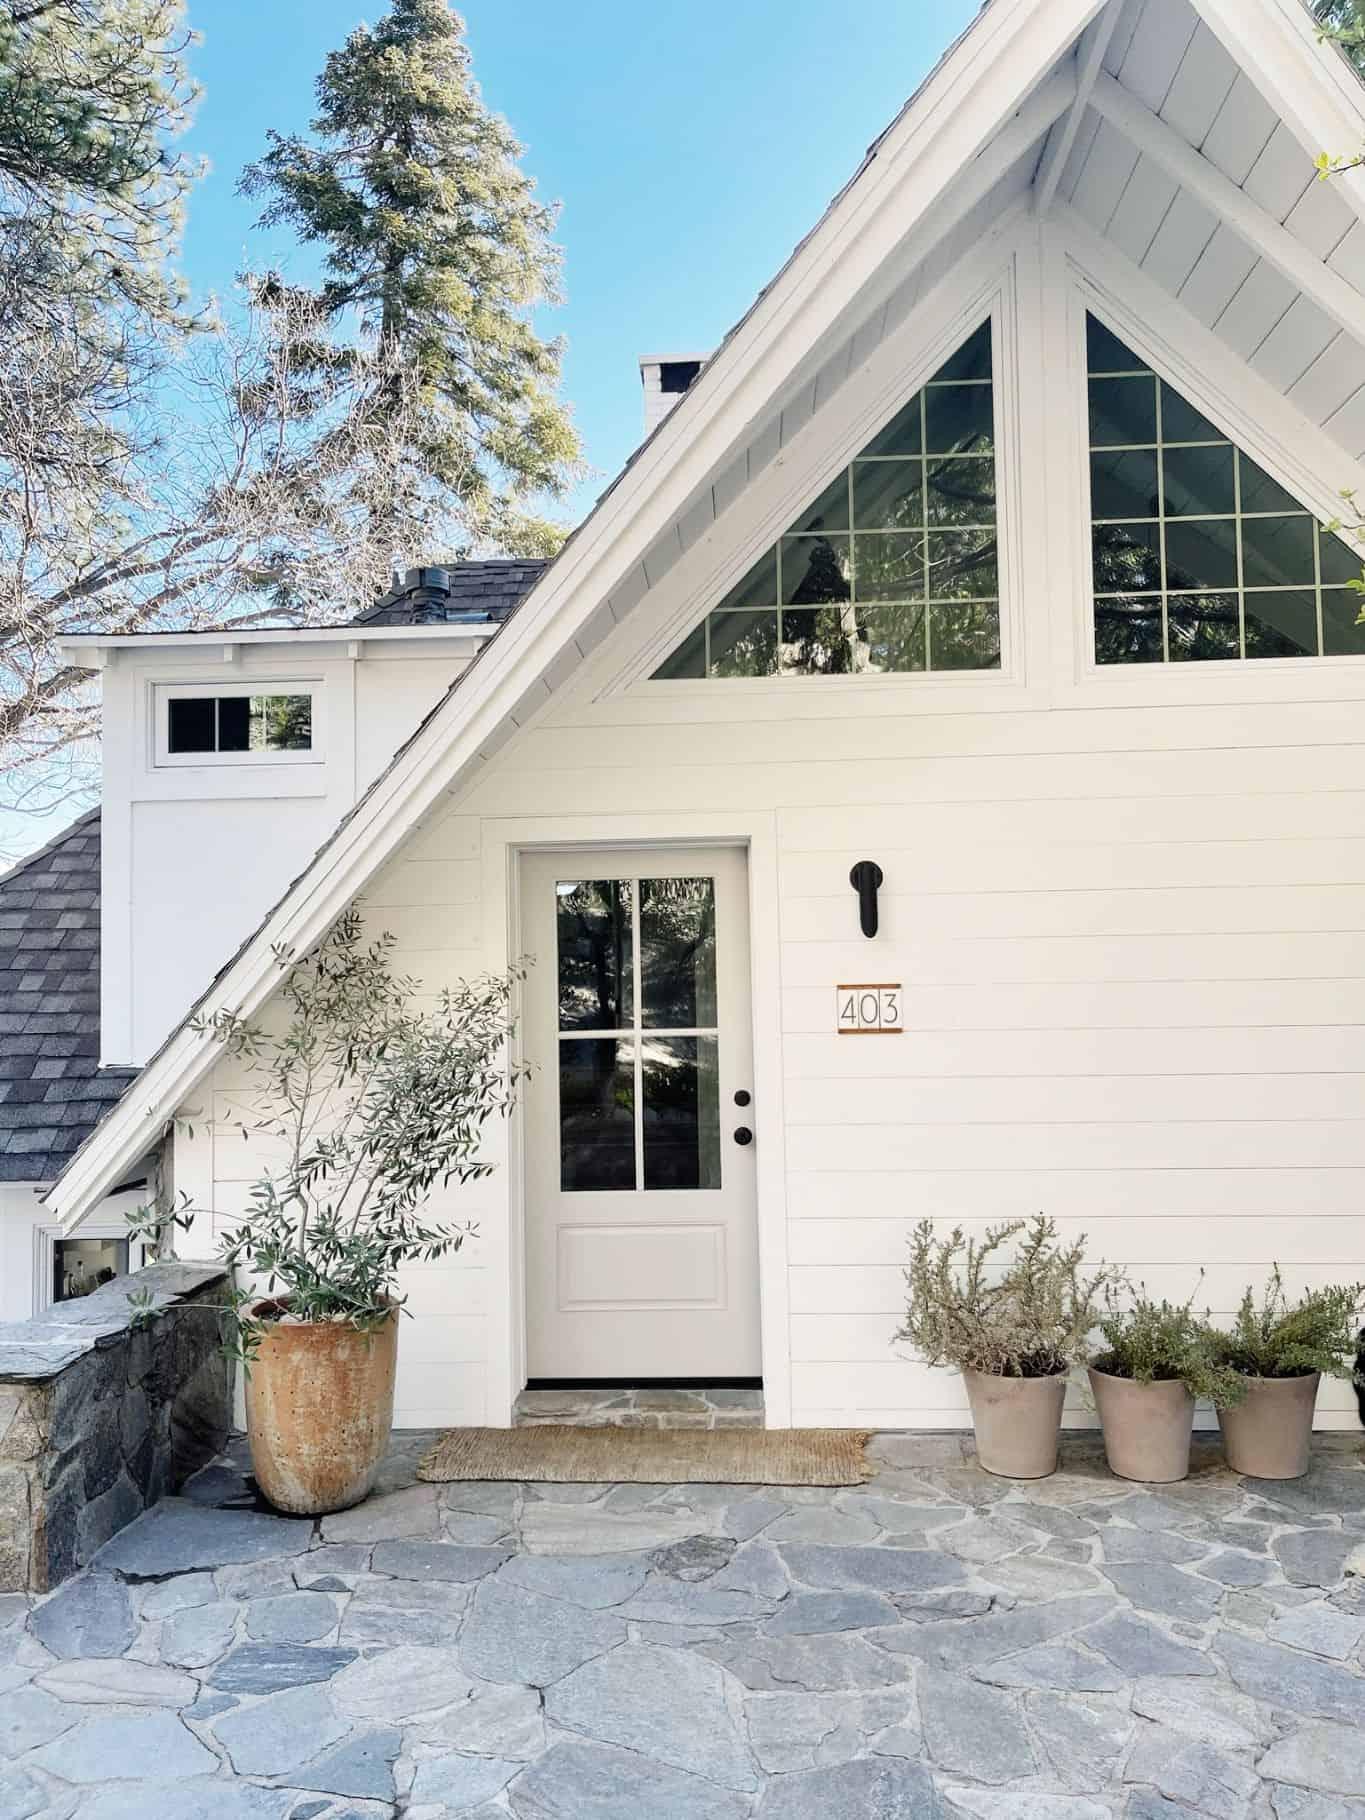 Best Airbnb Lake Arrowhead - Mindy Gayer Design Co.